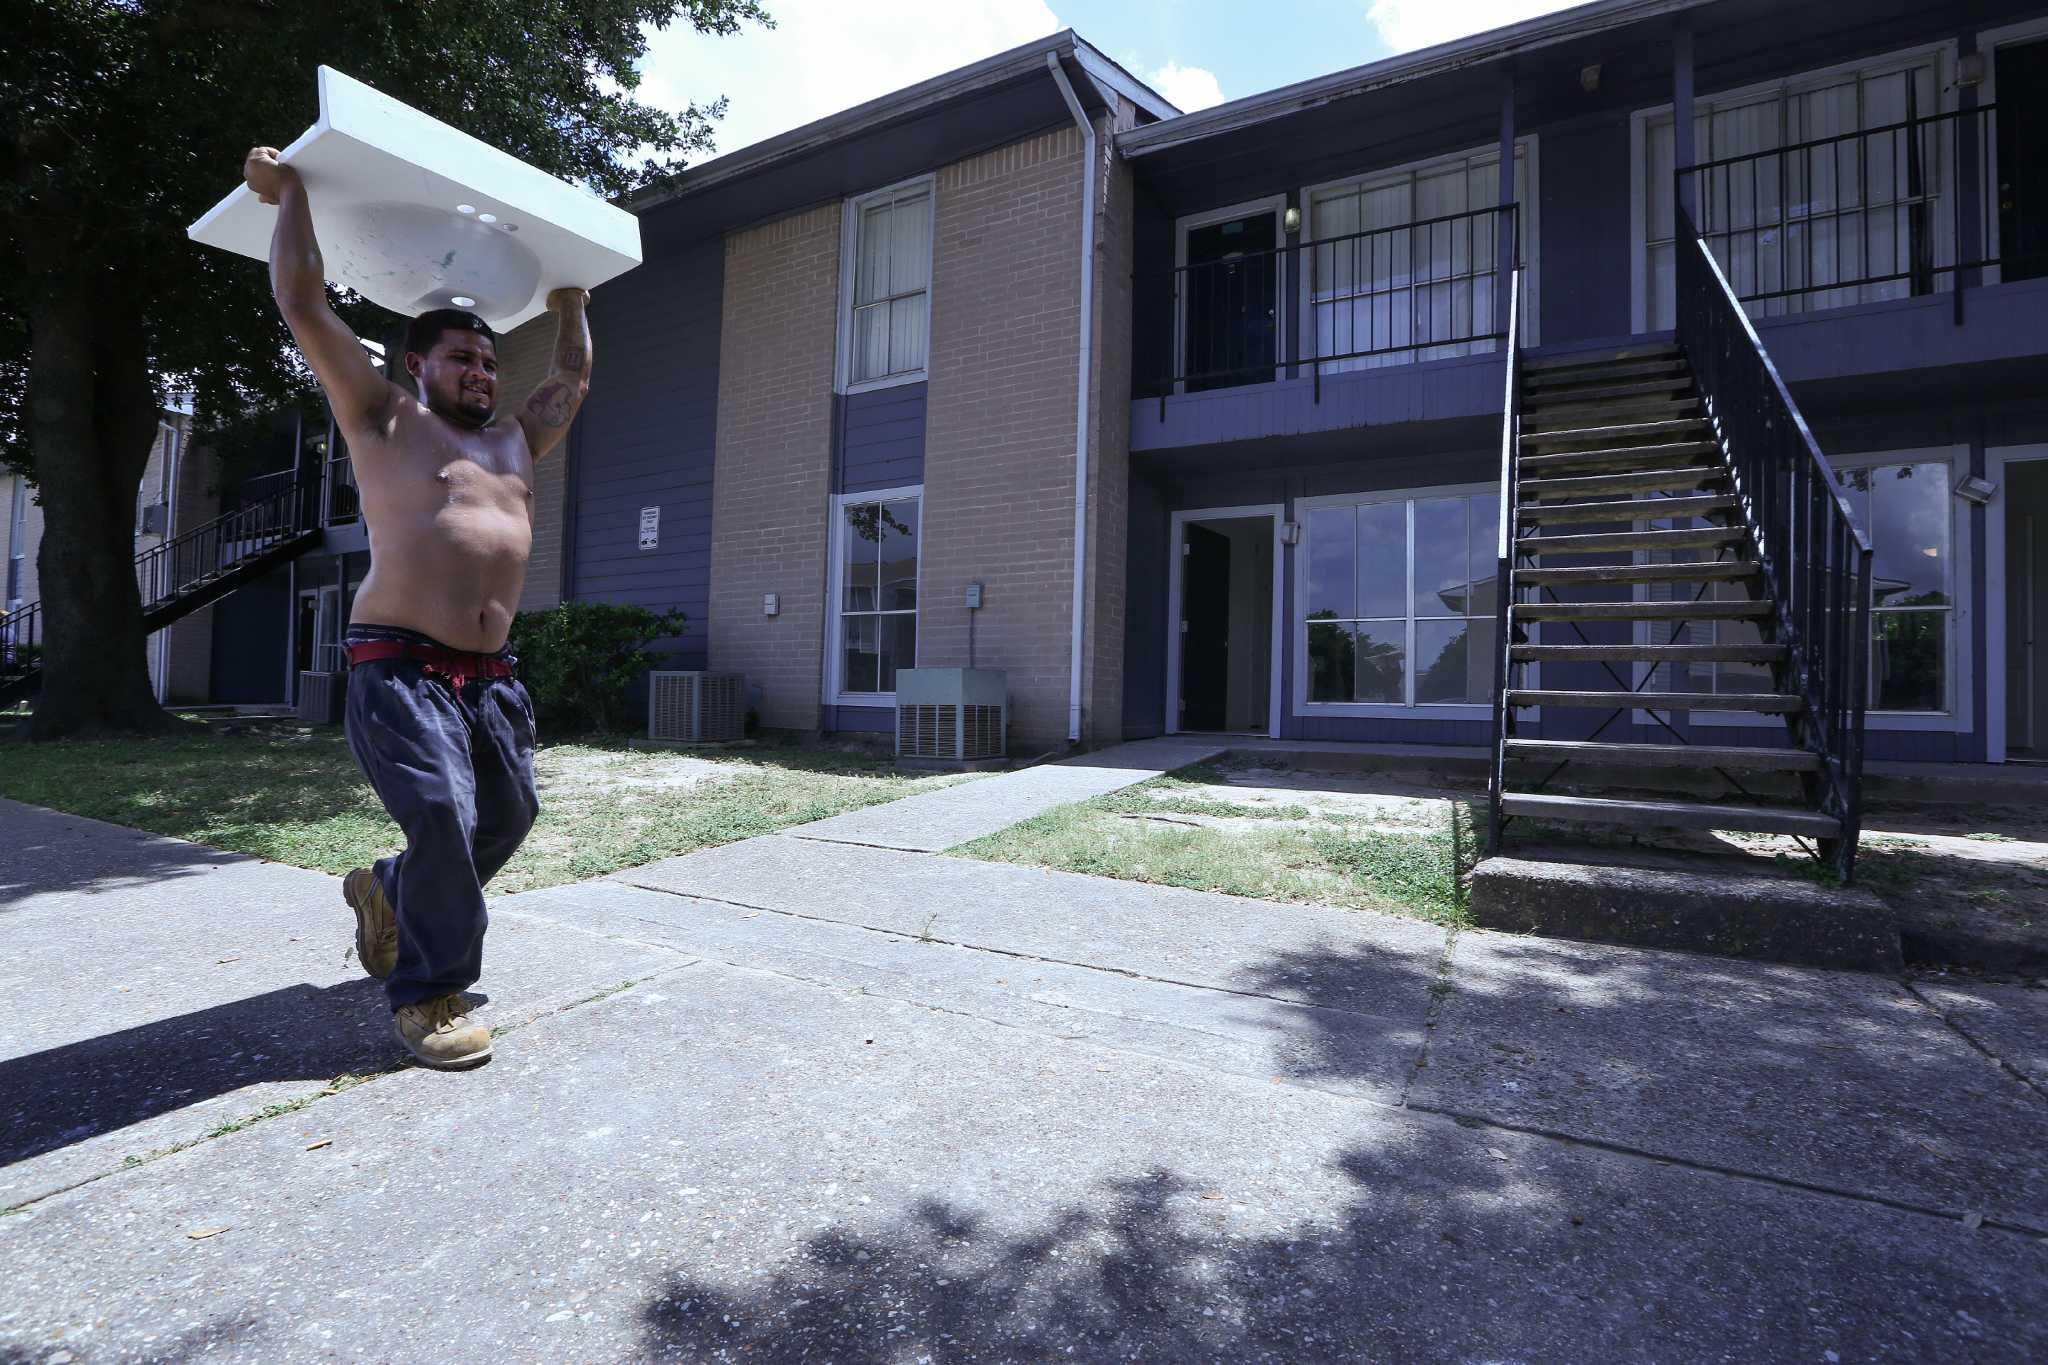 hud: city's subsidized housing procedures promote segregation